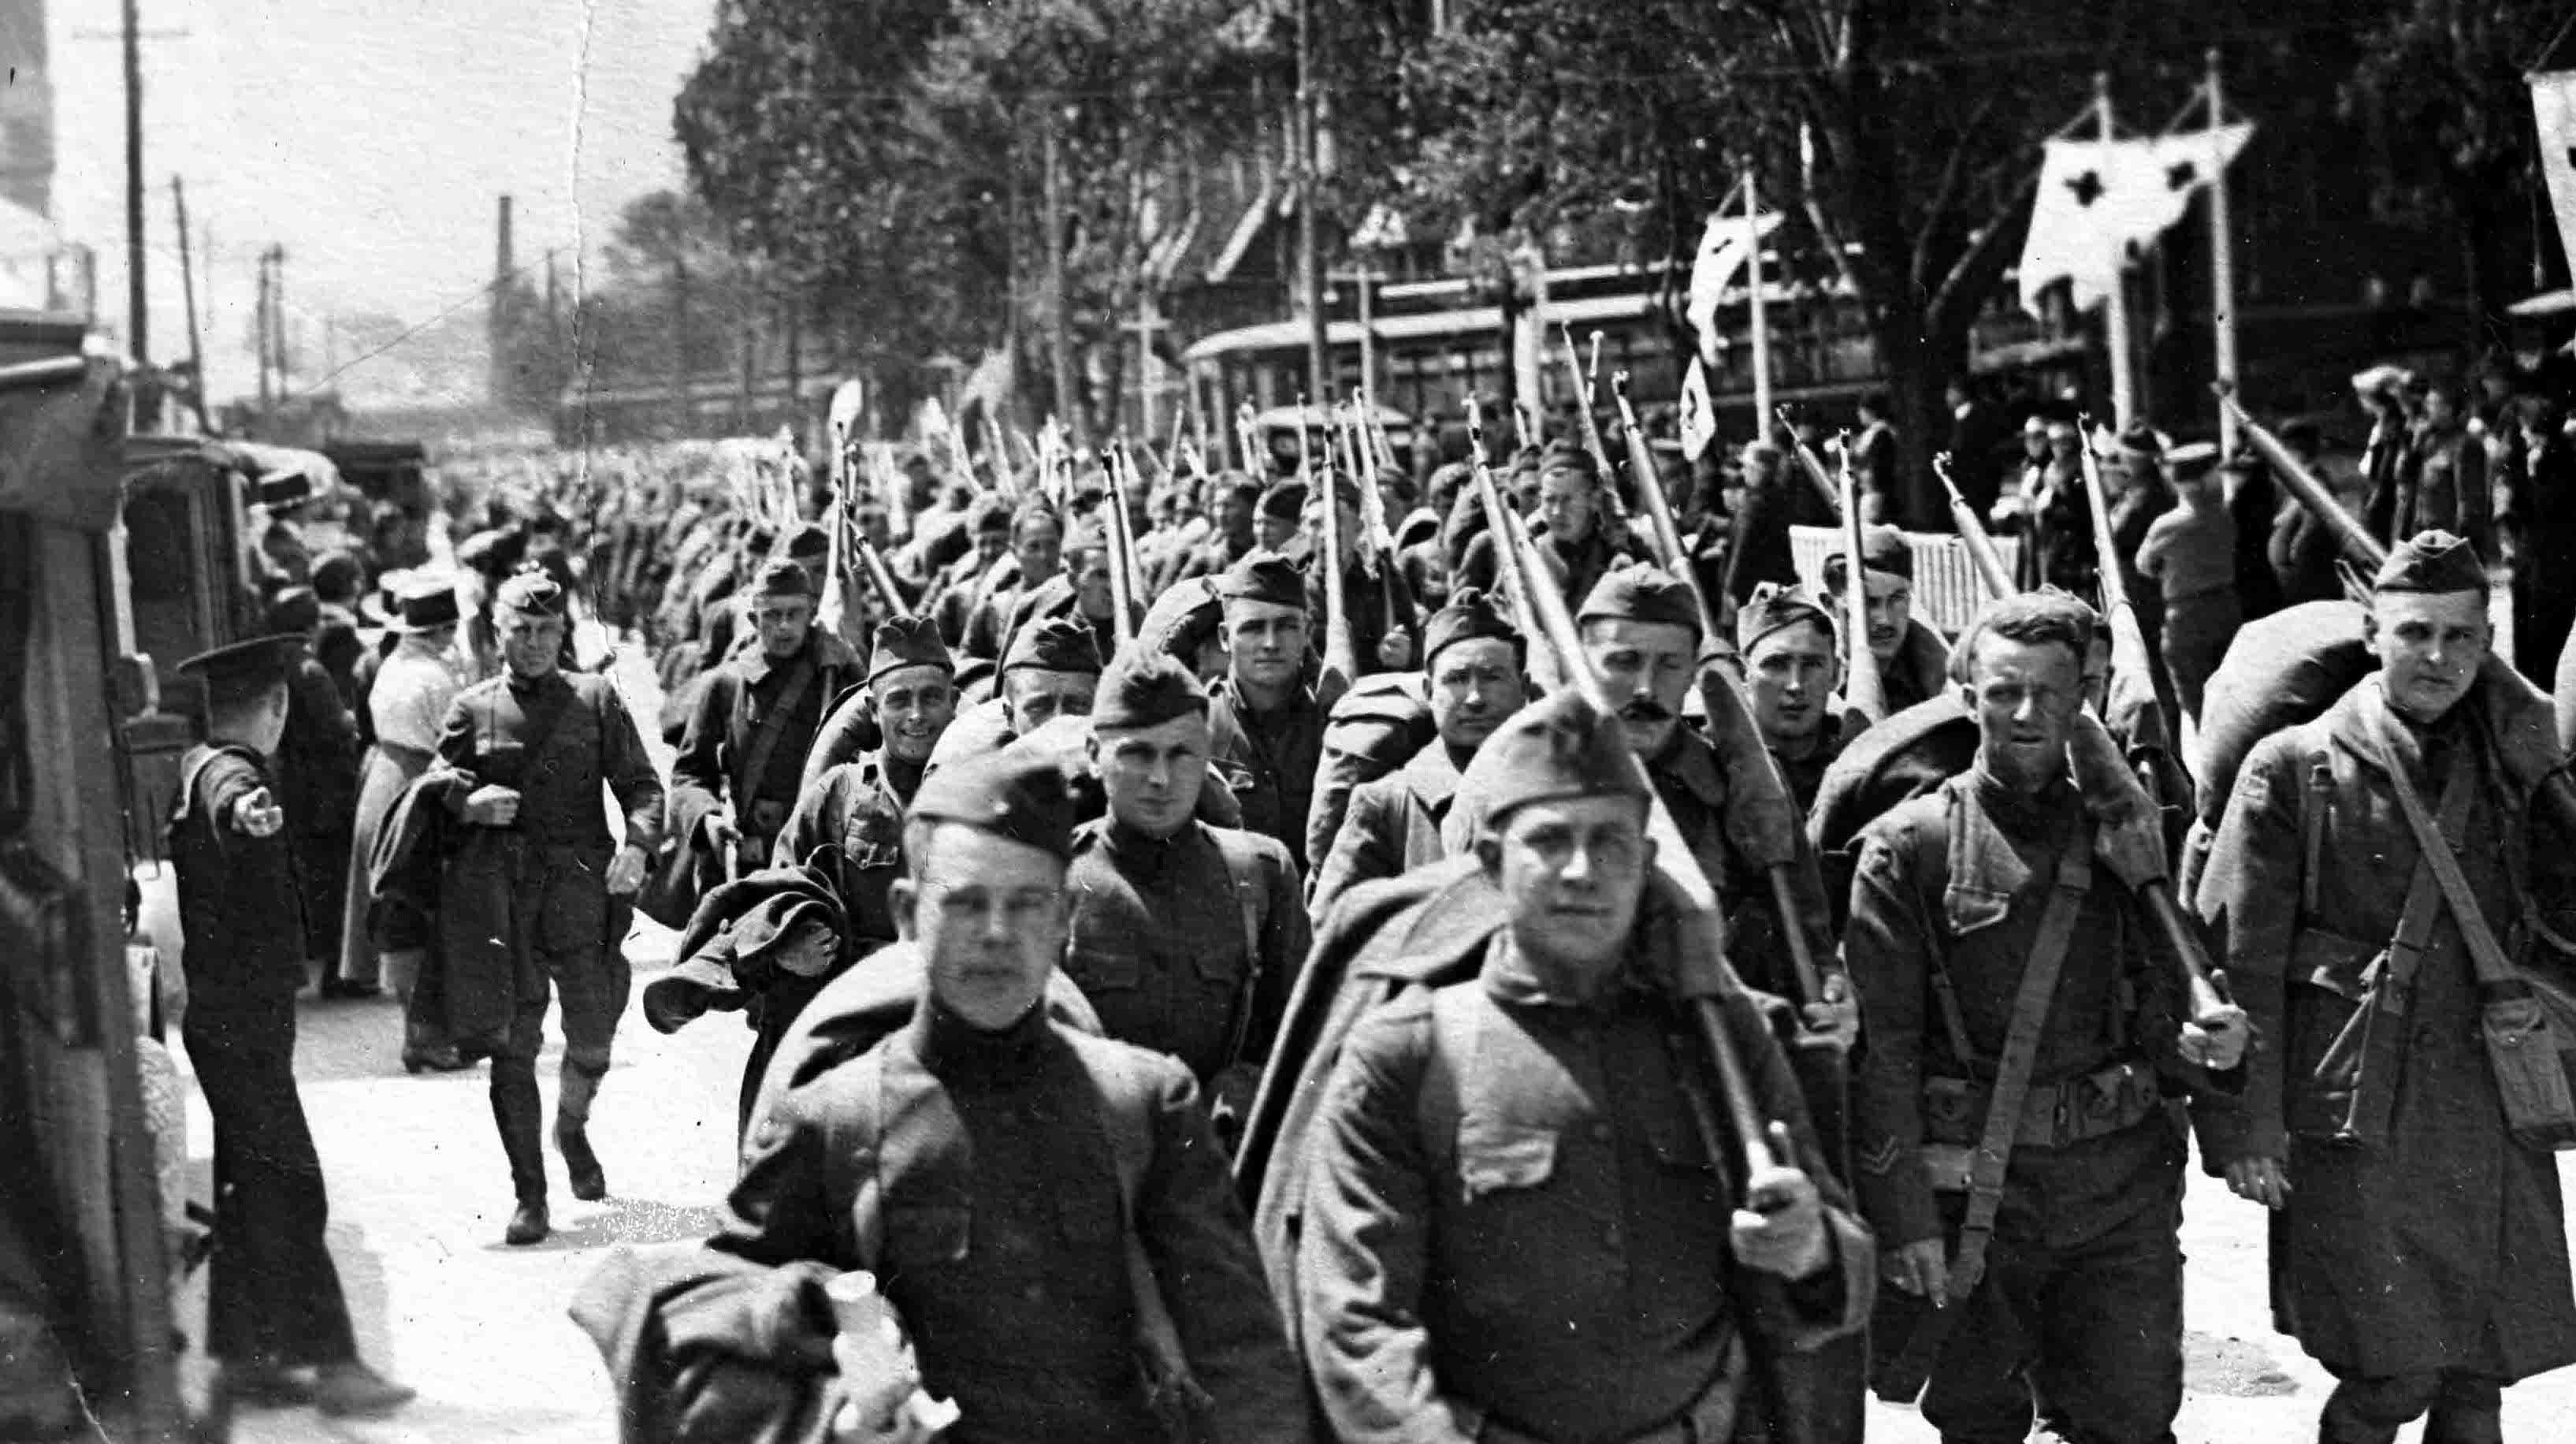 WWI Armistice Centennial Commemoration Event Image